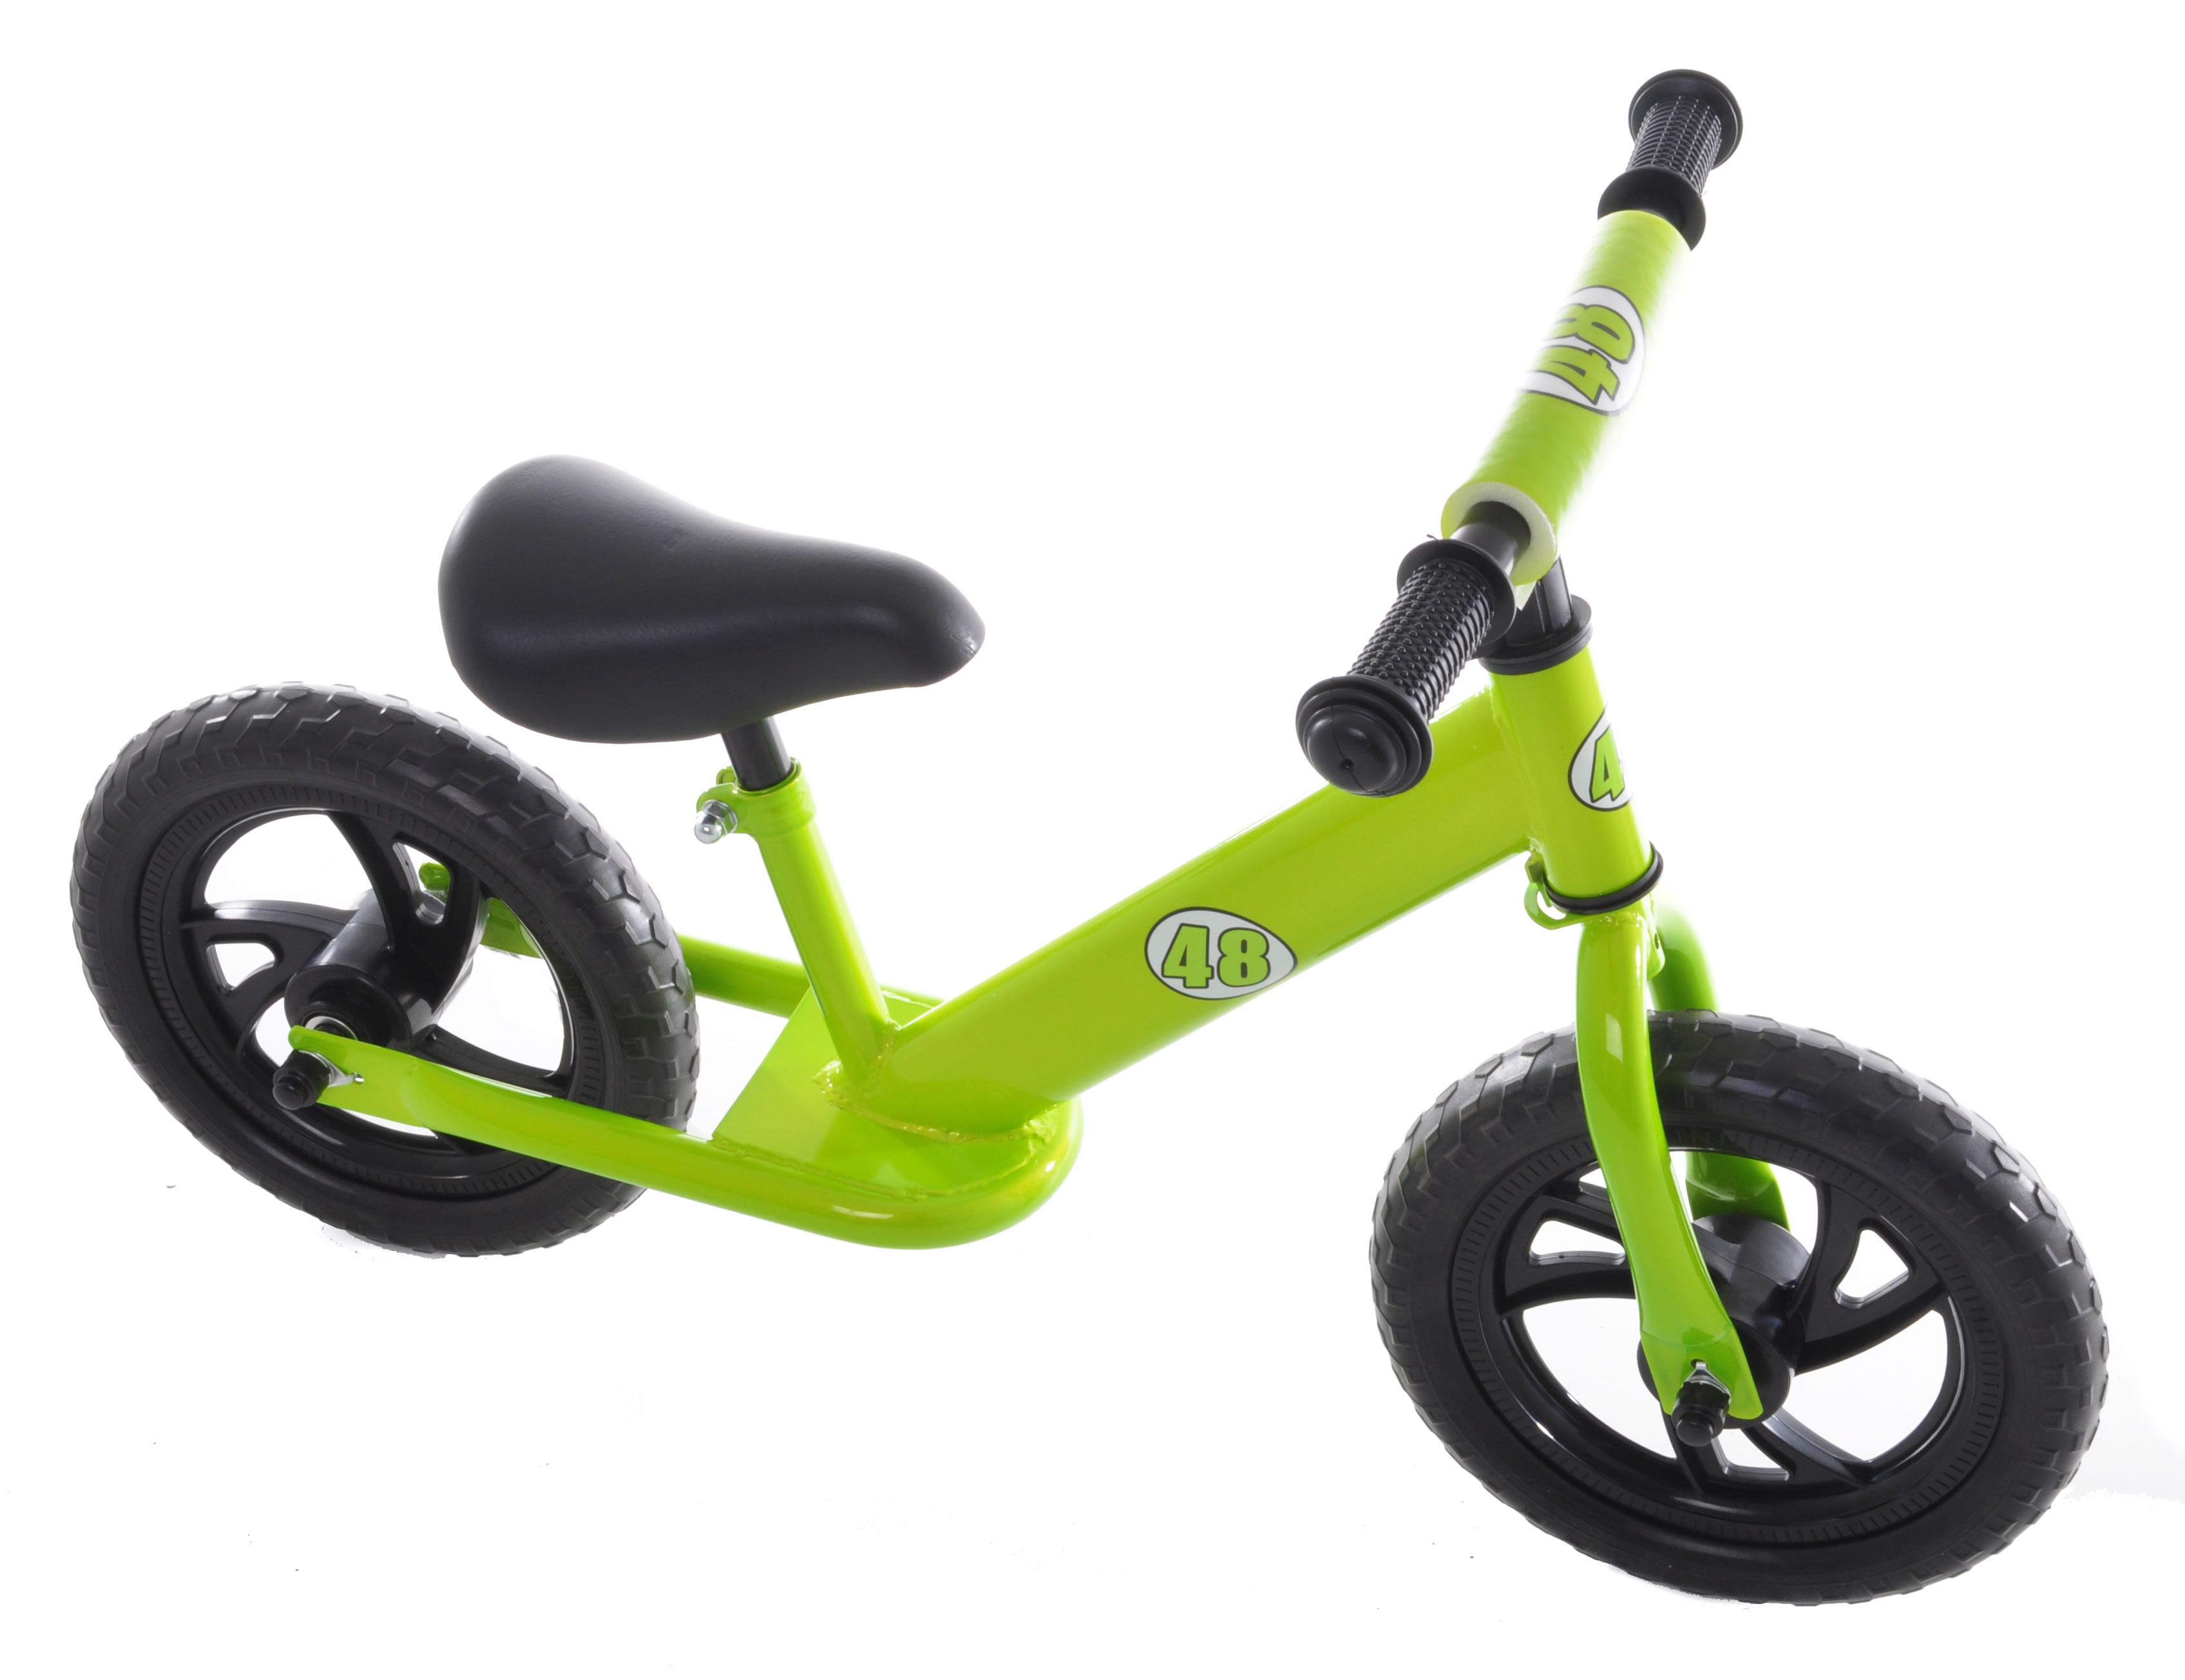 Vilano-Rally-Childrens-Balance-Bike-No-Pedal-Toddler-Push-Bicycle thumbnail 14